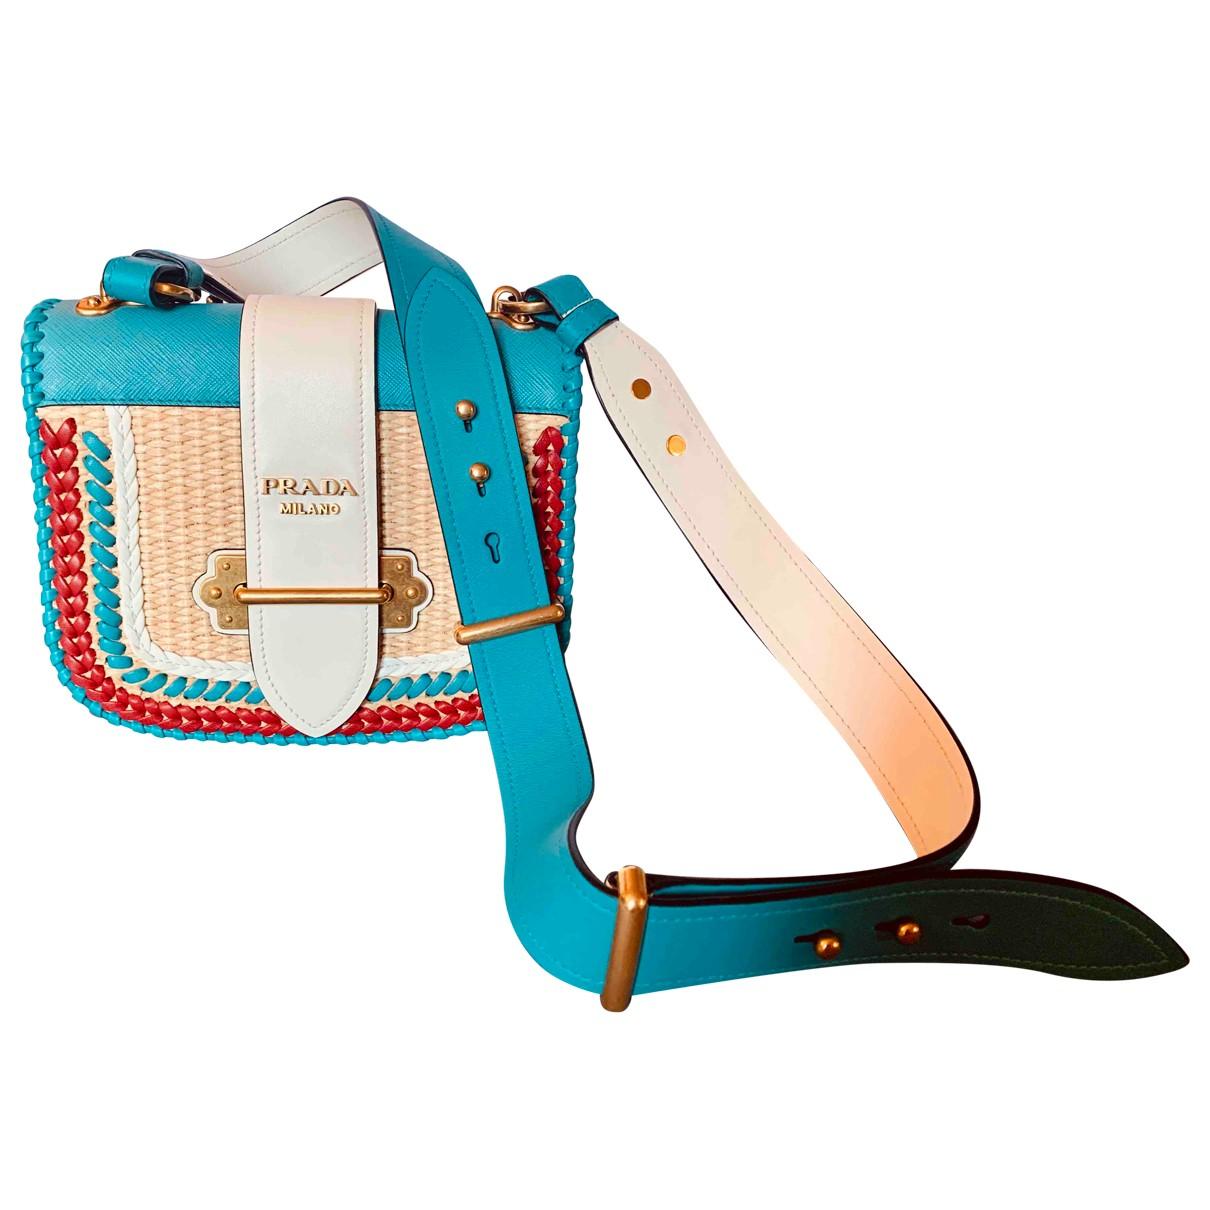 Prada - Sac a main Cahier pour femme en paille - bleu